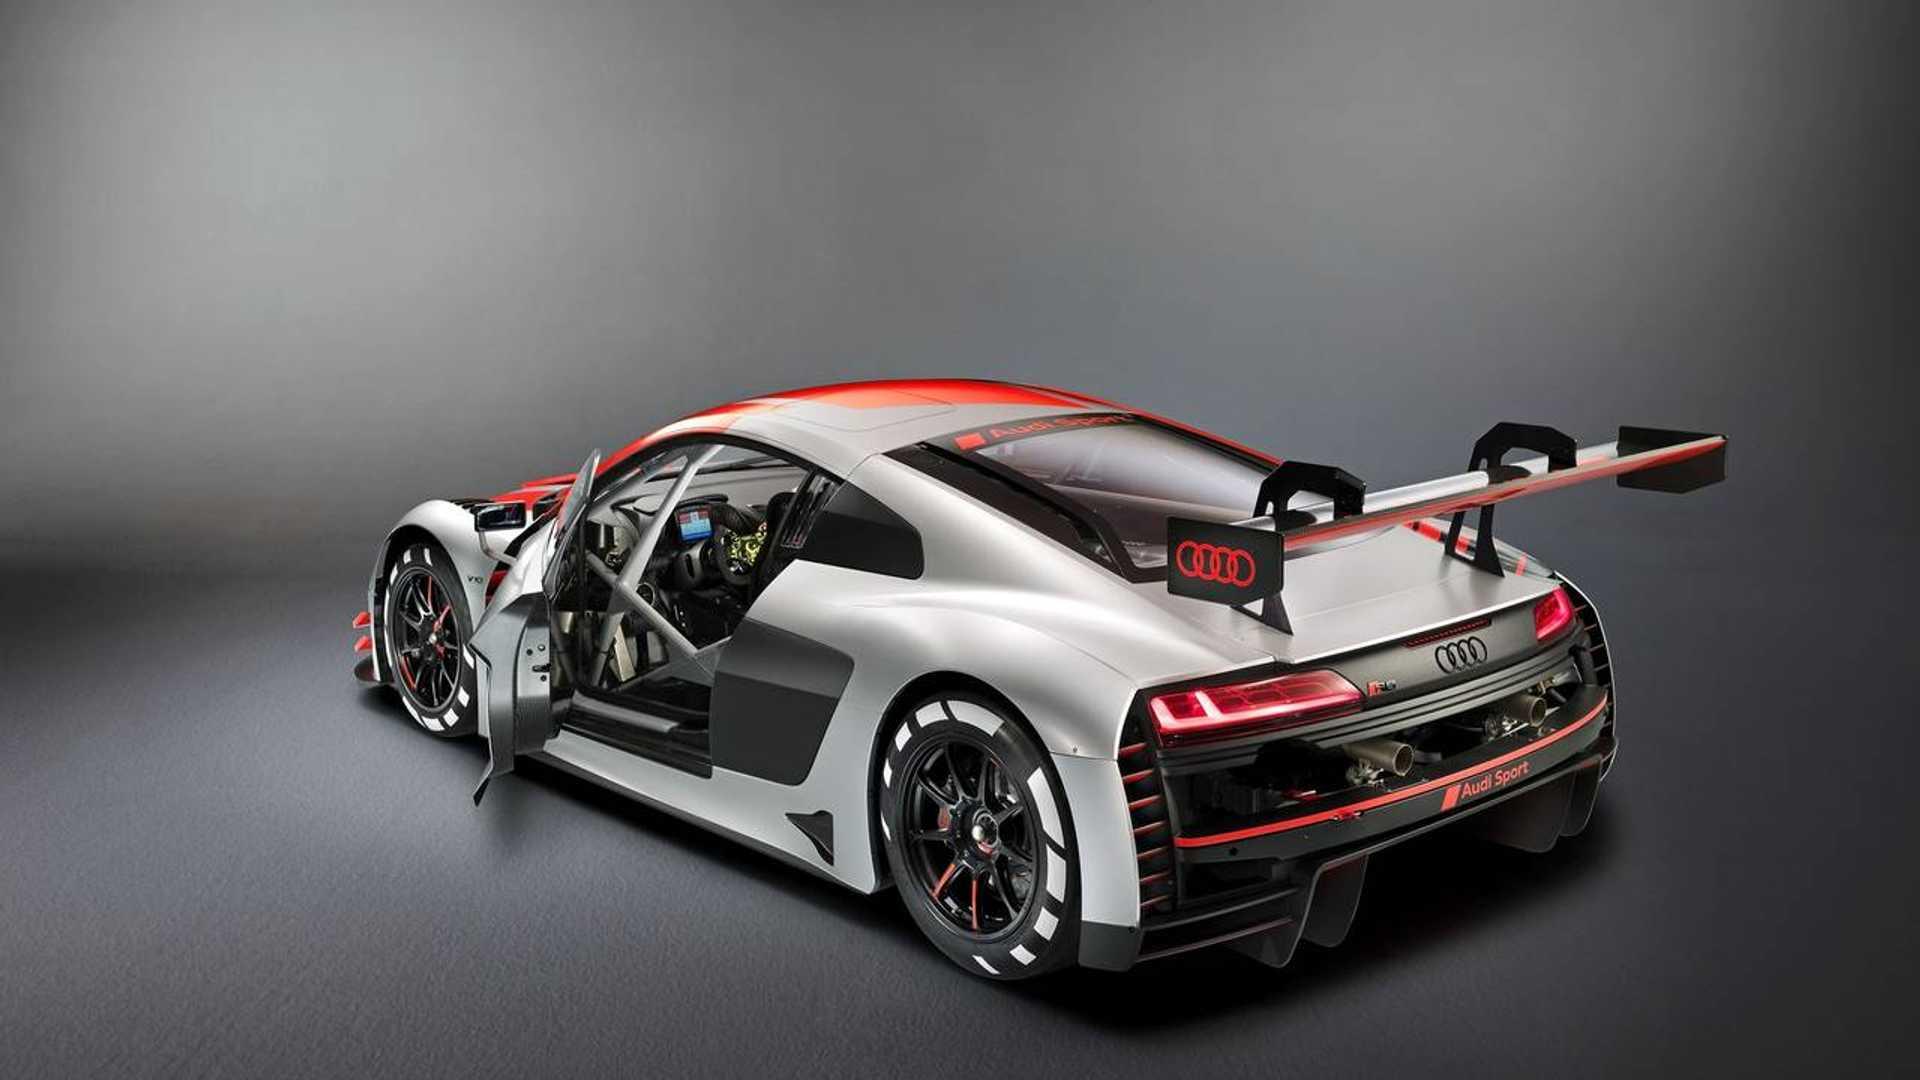 2019 Audi R8 LMS GT3 revealed at Paris Motor Show